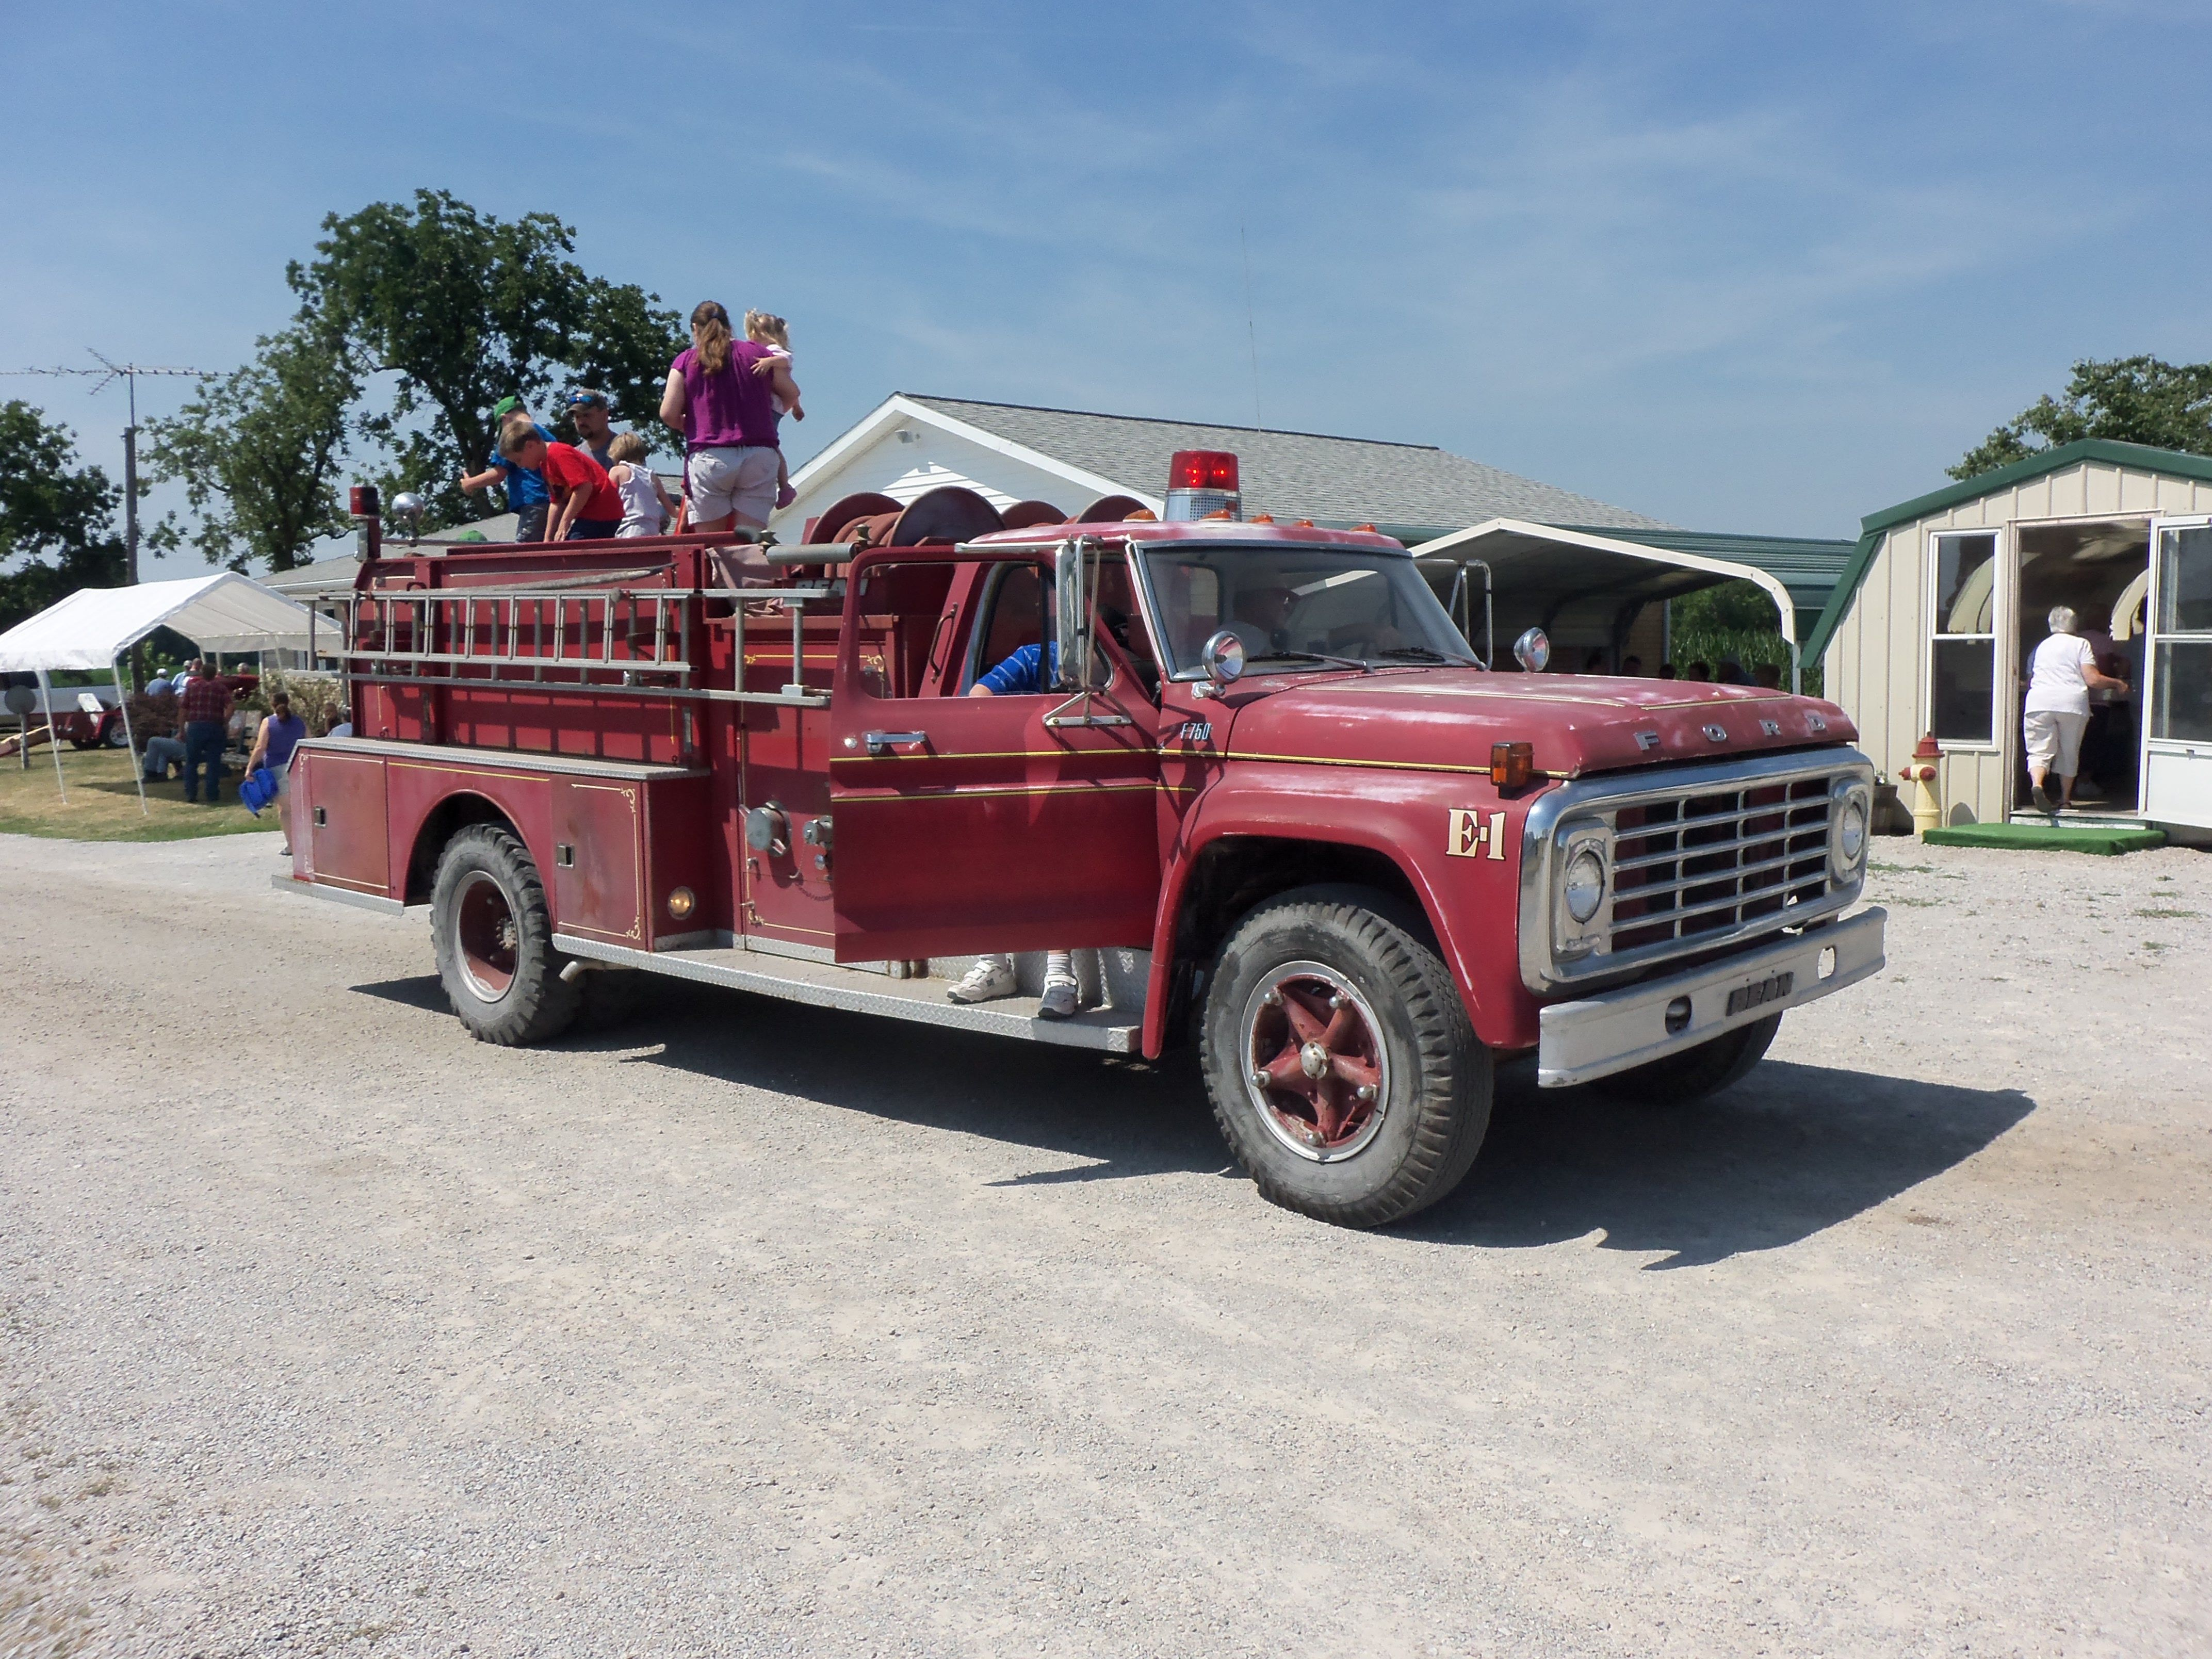 1970 ford f series fire truck fire trucks pinterest. Black Bedroom Furniture Sets. Home Design Ideas